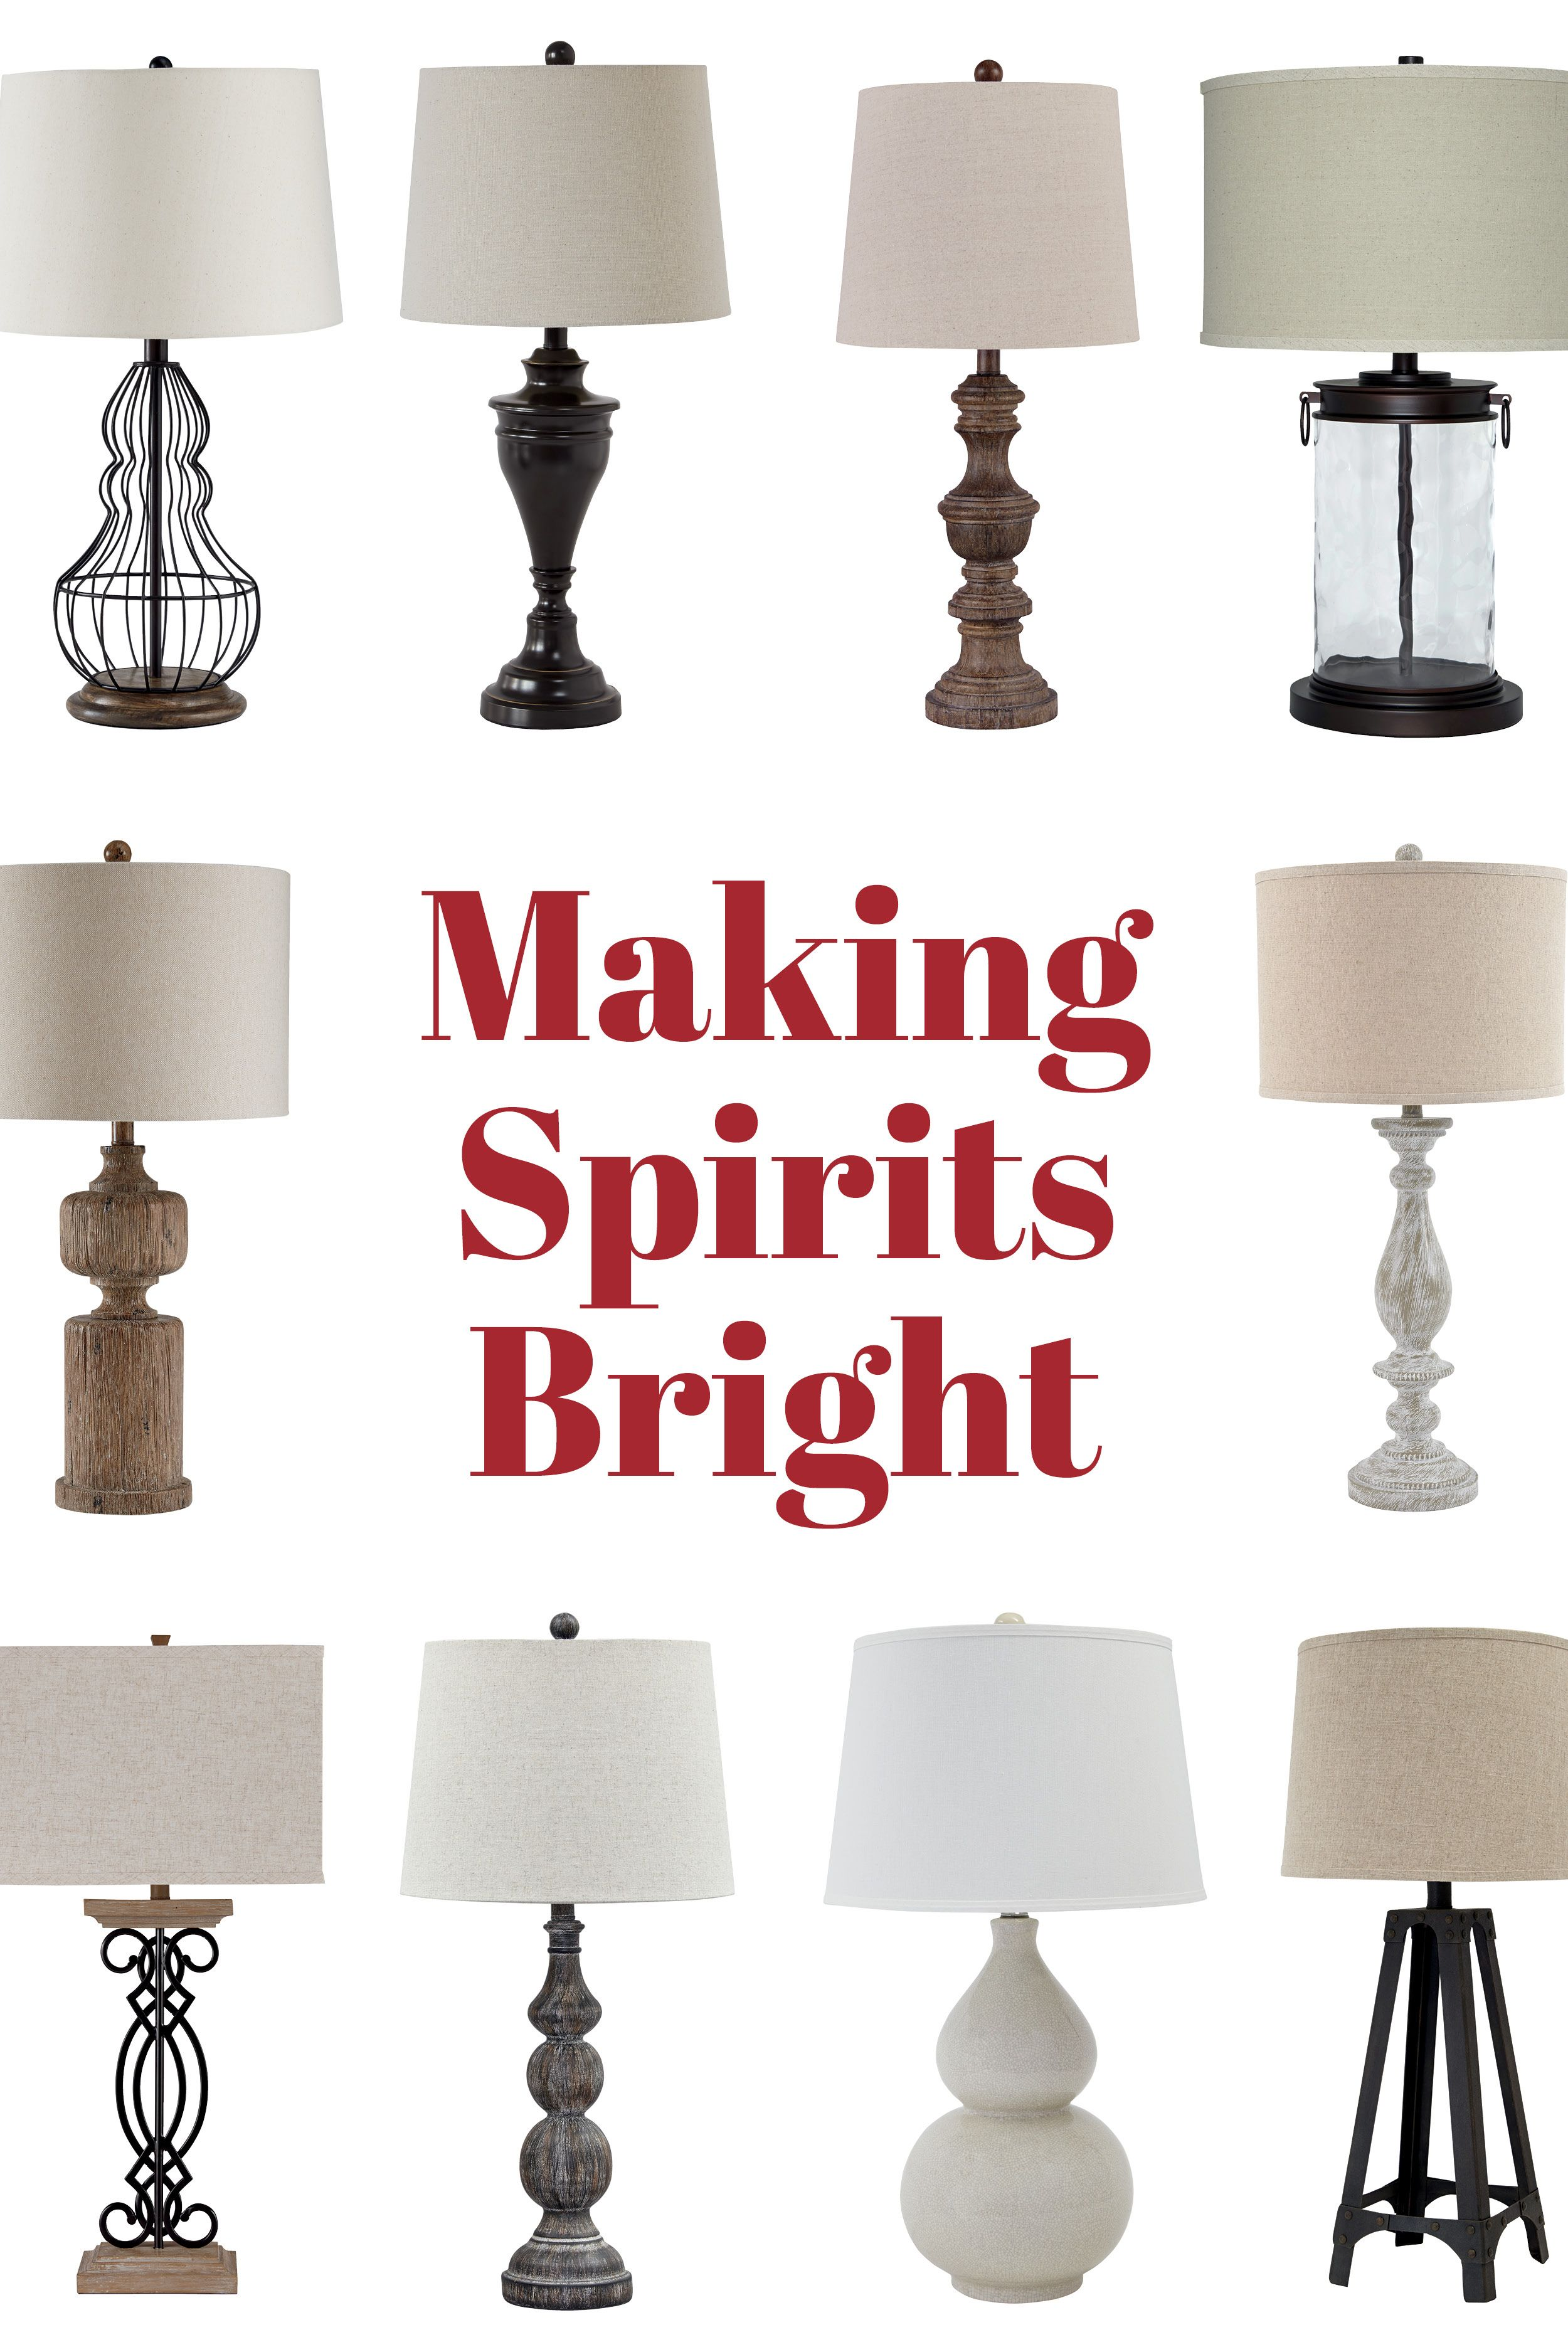 Make Spirits Bright With These Lamps From Ashley Furniture Holidaydecor Ashleyfurniture Ashley Furniture Making Spirits Bright